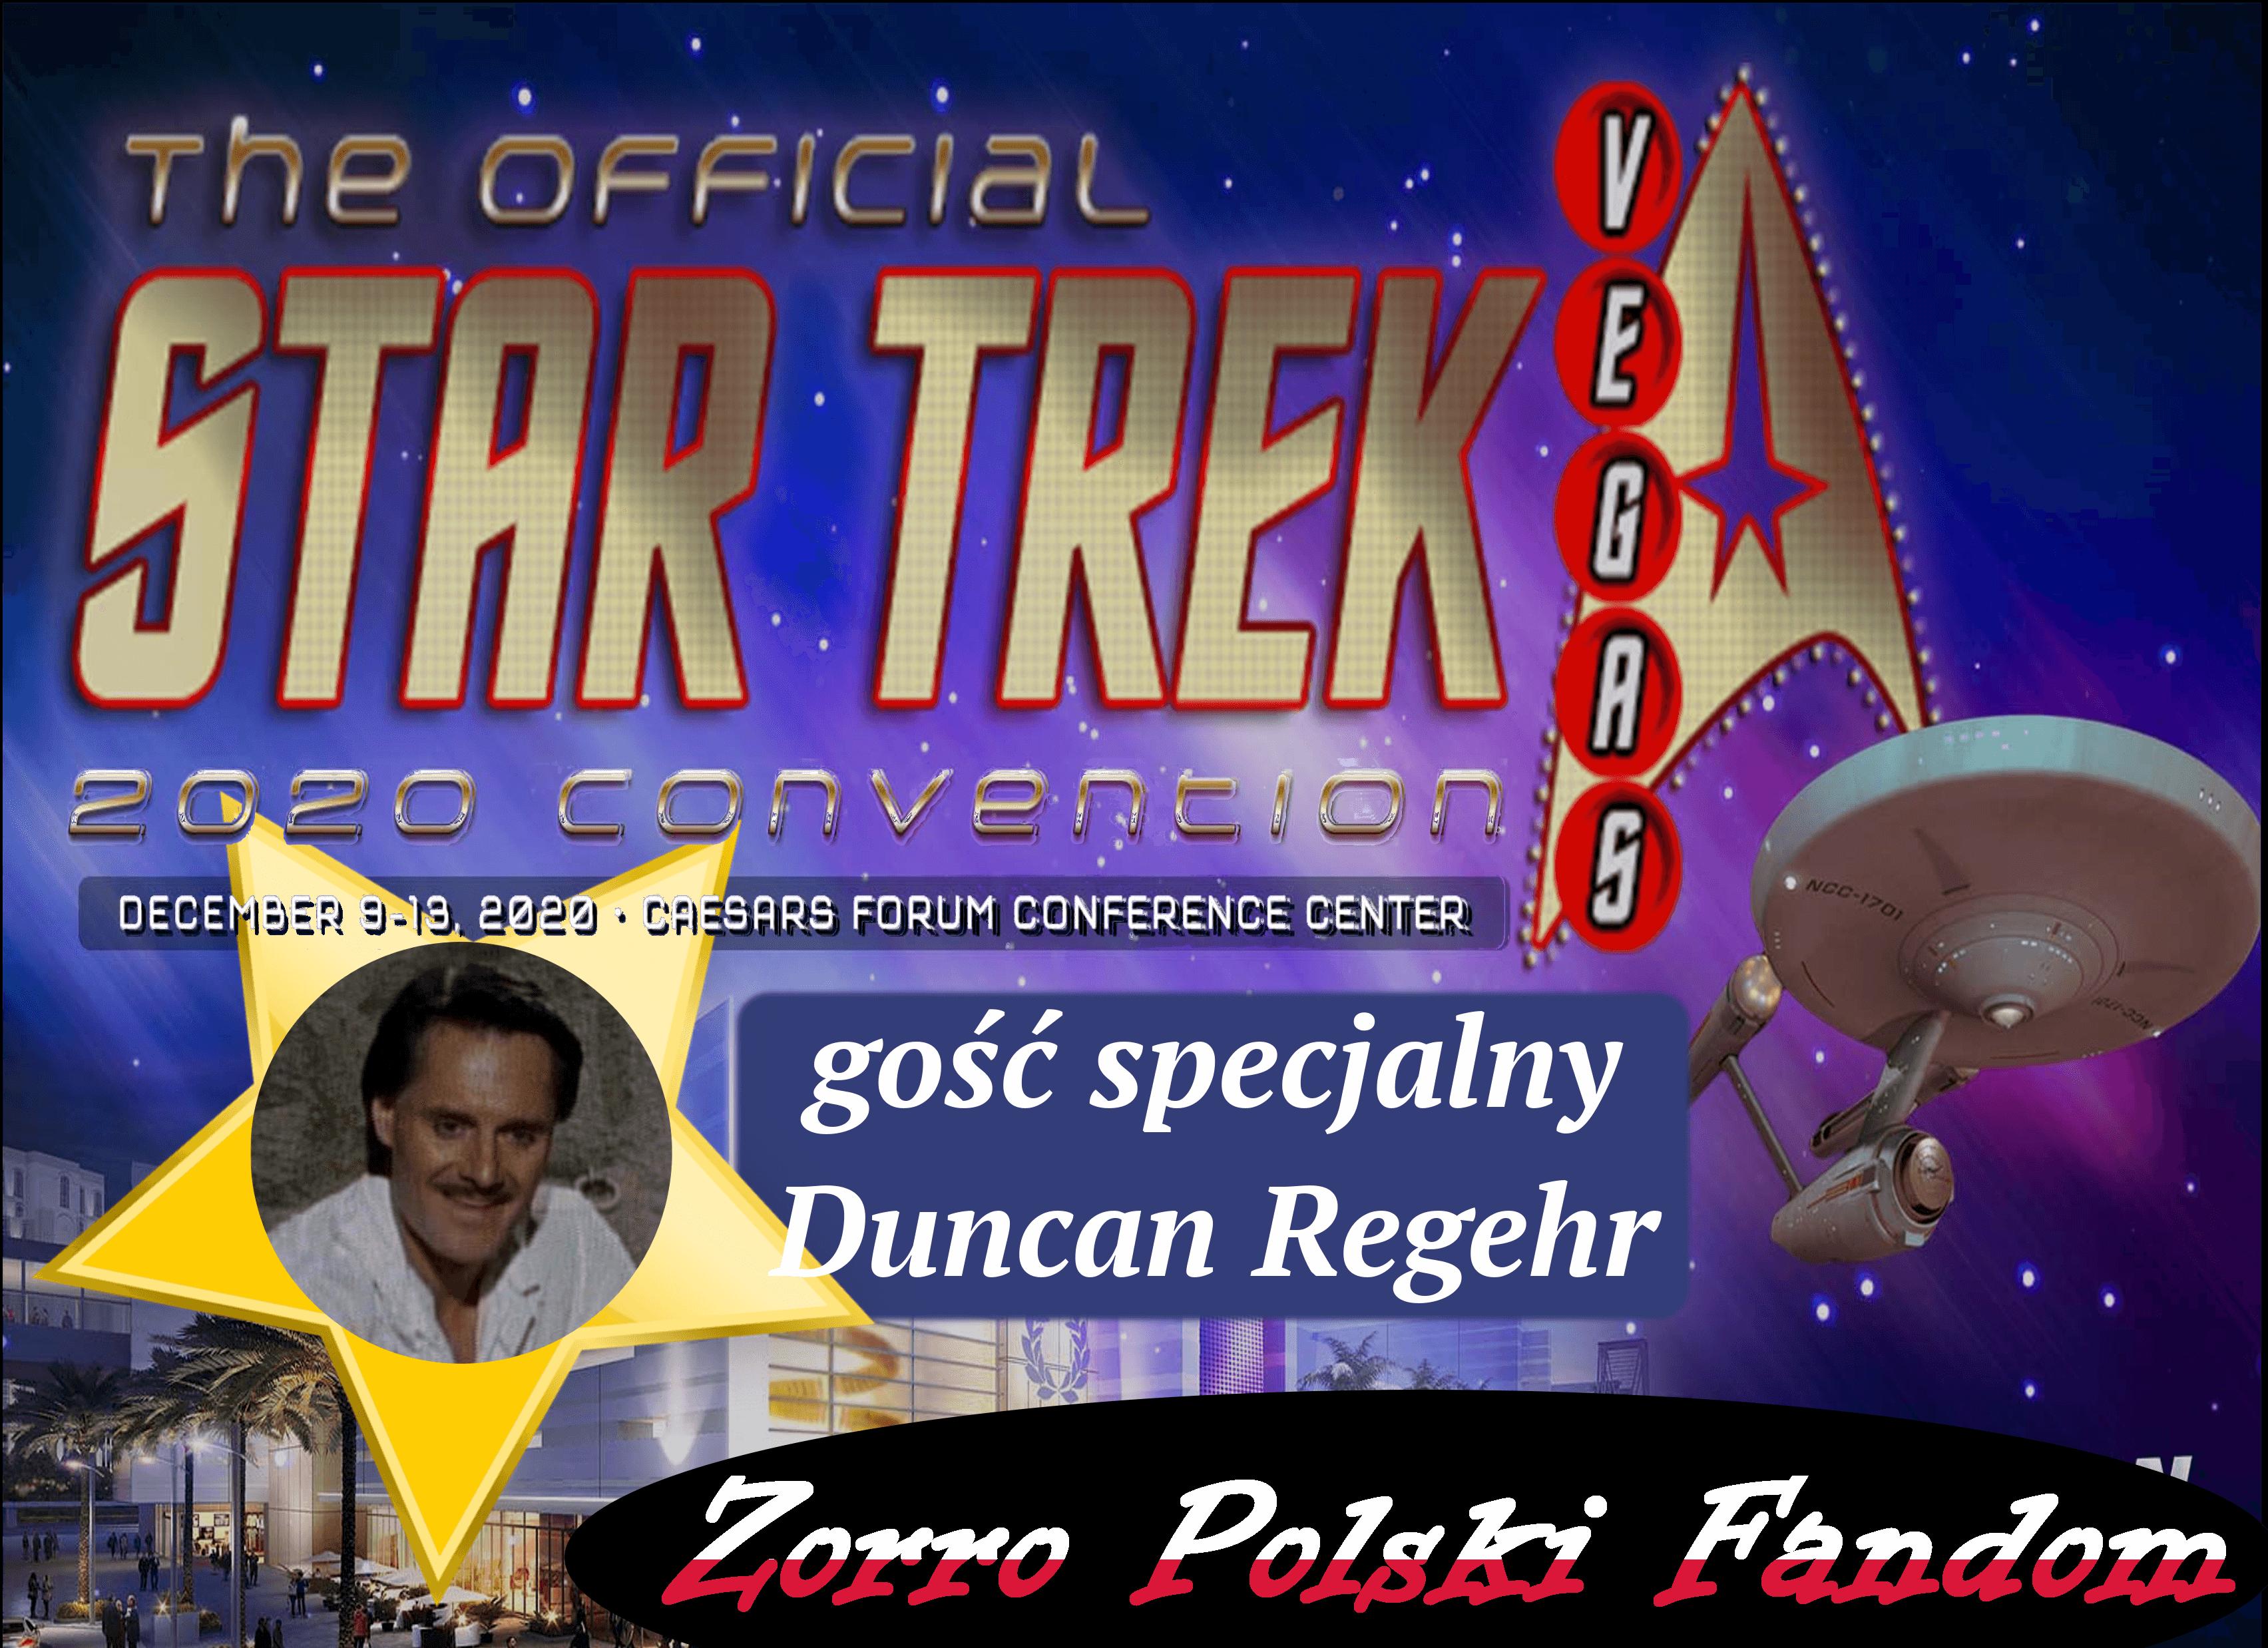 STAR TREK Celebration in Las Vegas 2020 PL Duncan Regehr